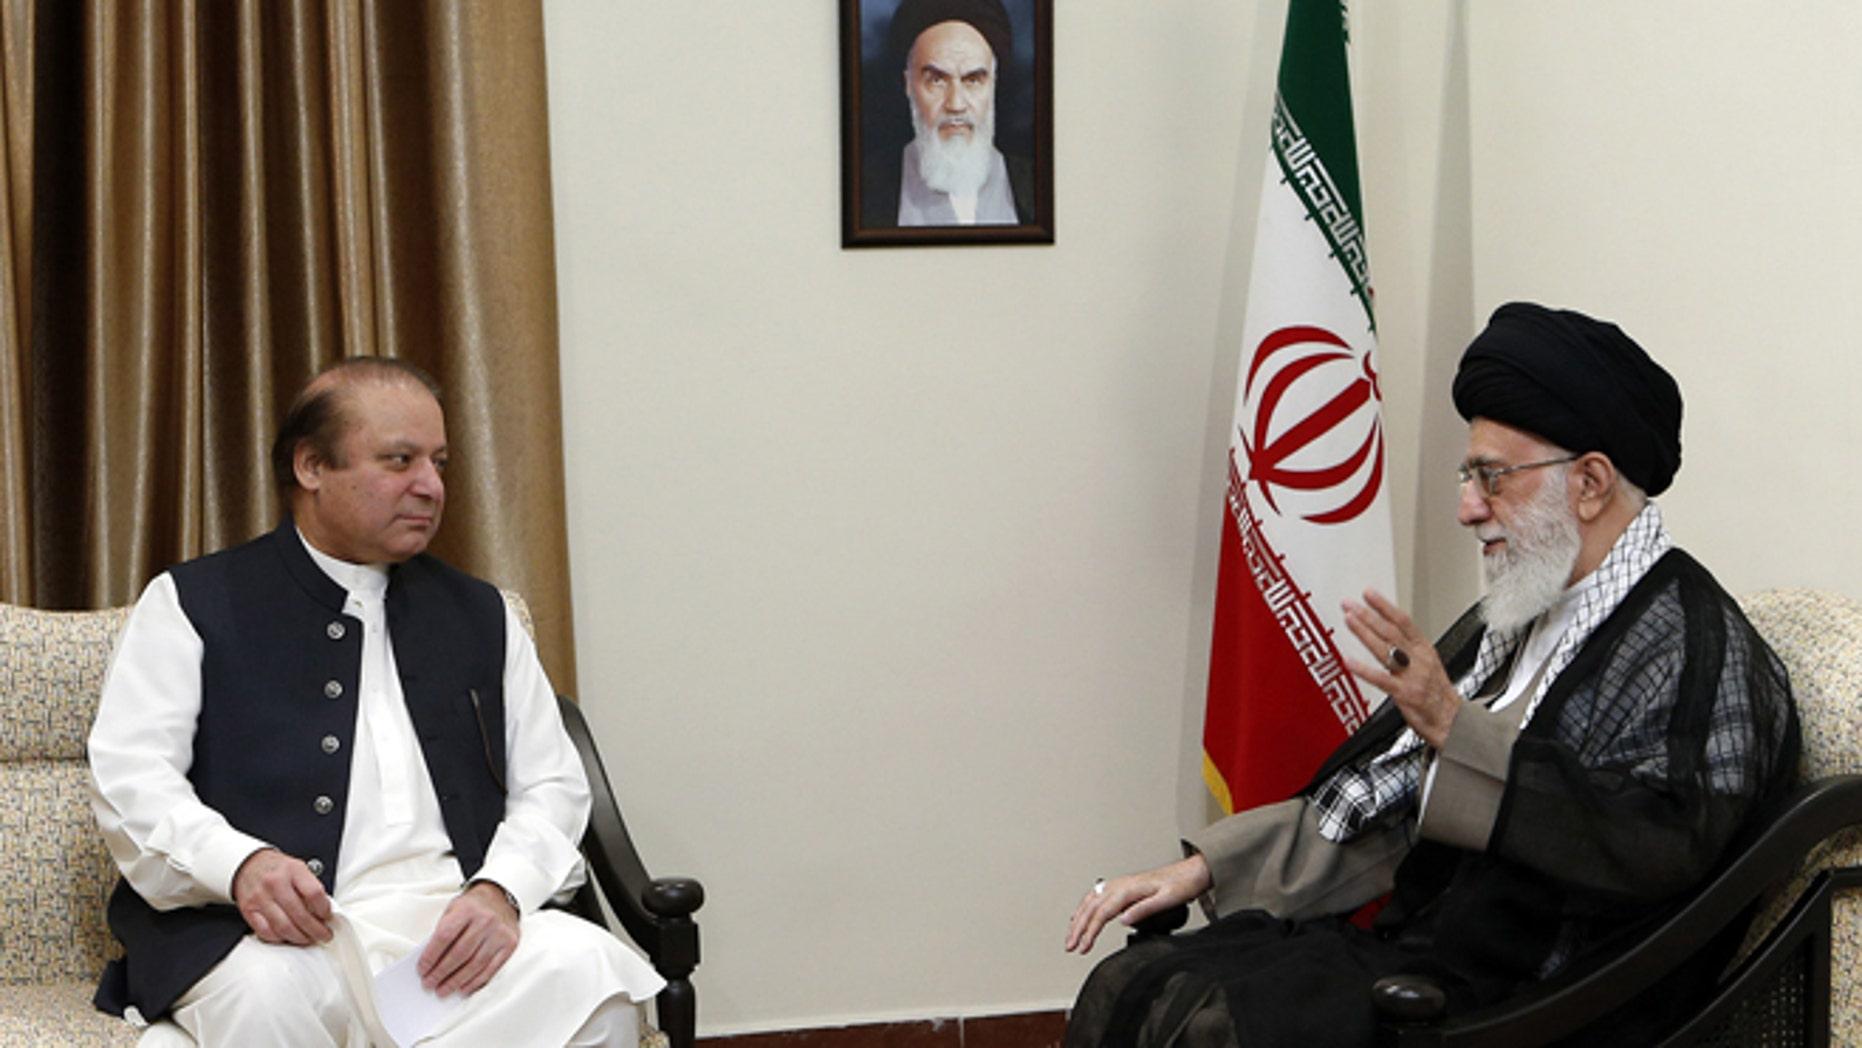 May 12, 2014: Iranian supreme leader, Supreme Leader Ayatollah Ali Khamenei, right, speaks with Pakistani Prime Minister Nawaz Sharif during their meeting in Tehran, Iran. (AP/Office of the Iranian Supreme Leader)